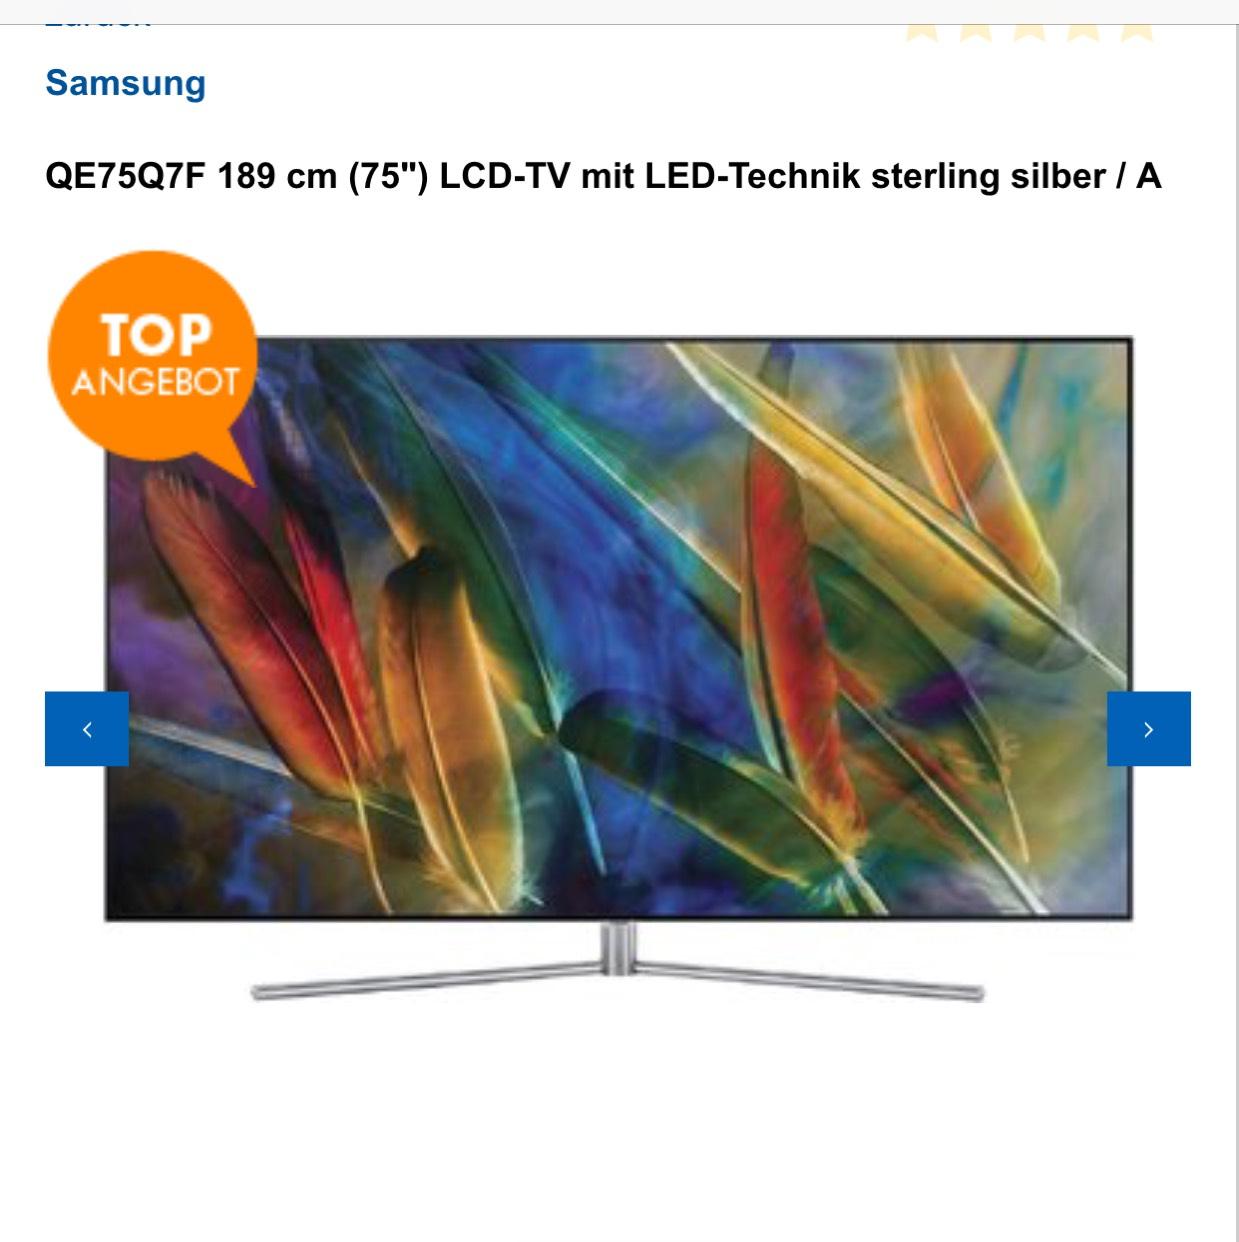 Samsung QE75Q7F 189 Zentimeter (75 Zoll) LCD-TV 4K